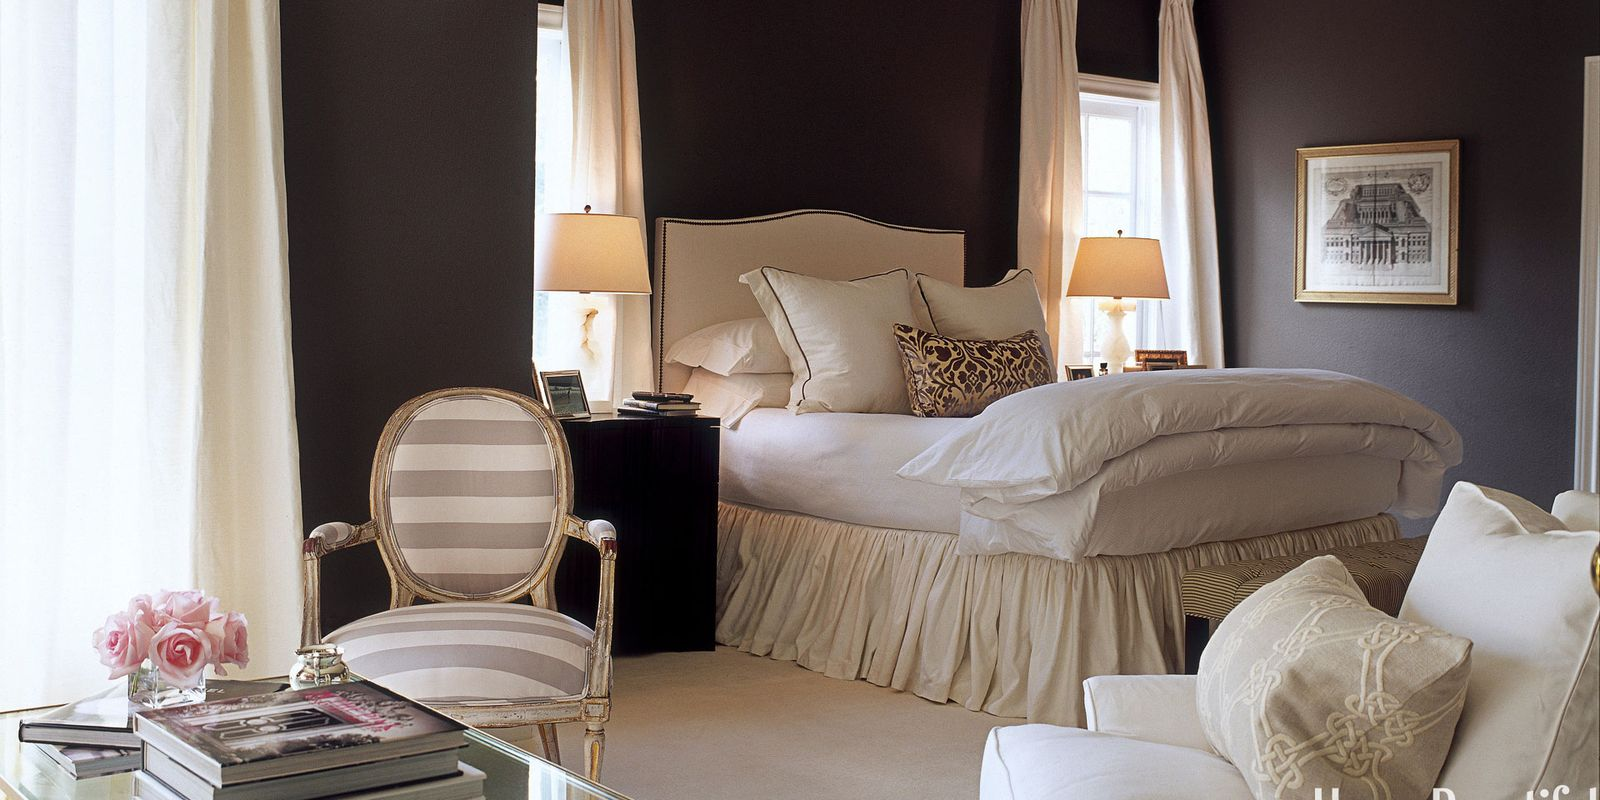 Cozy Bedroom House Beautiful Pinterest Favorite Pins